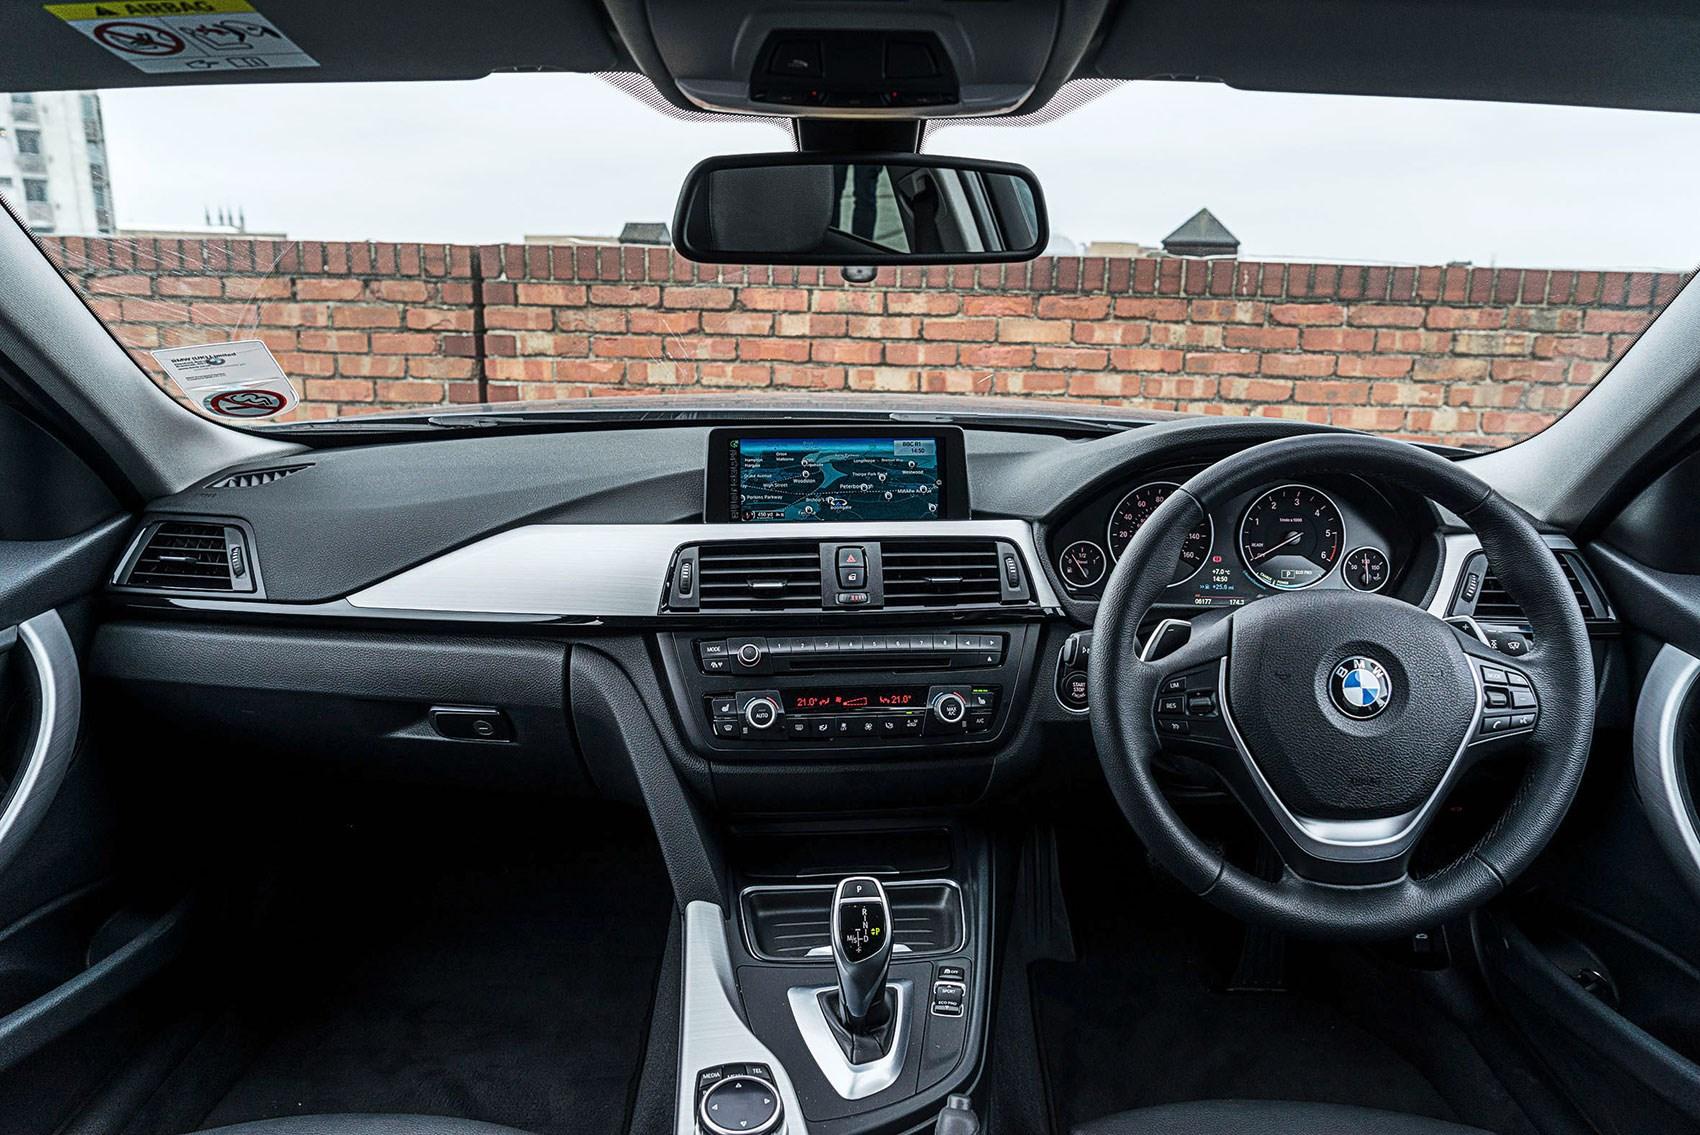 VW Passat Estate Vs Ford Mondeo Vs BMW Series Touring Vs Mazda - Bmw 3 series touring